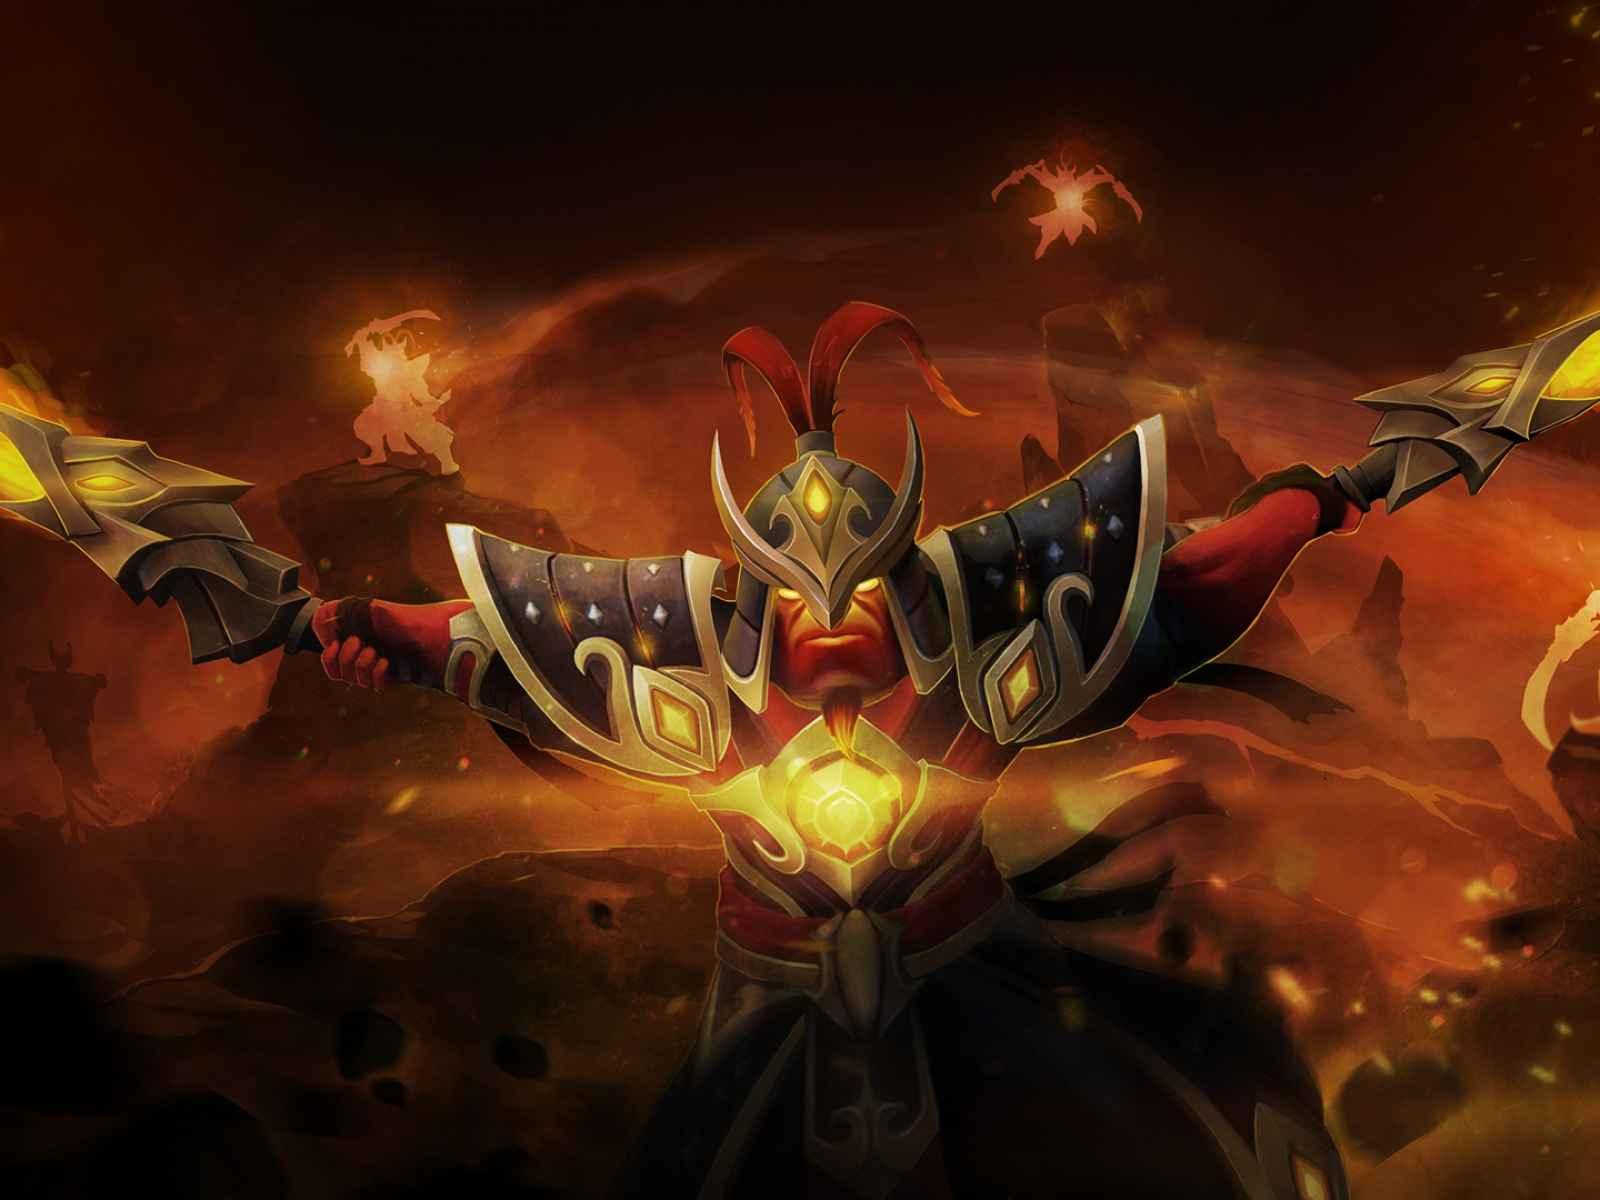 Dota 2, Xin, Ember spirit, Fire 1600×1200 HD Background